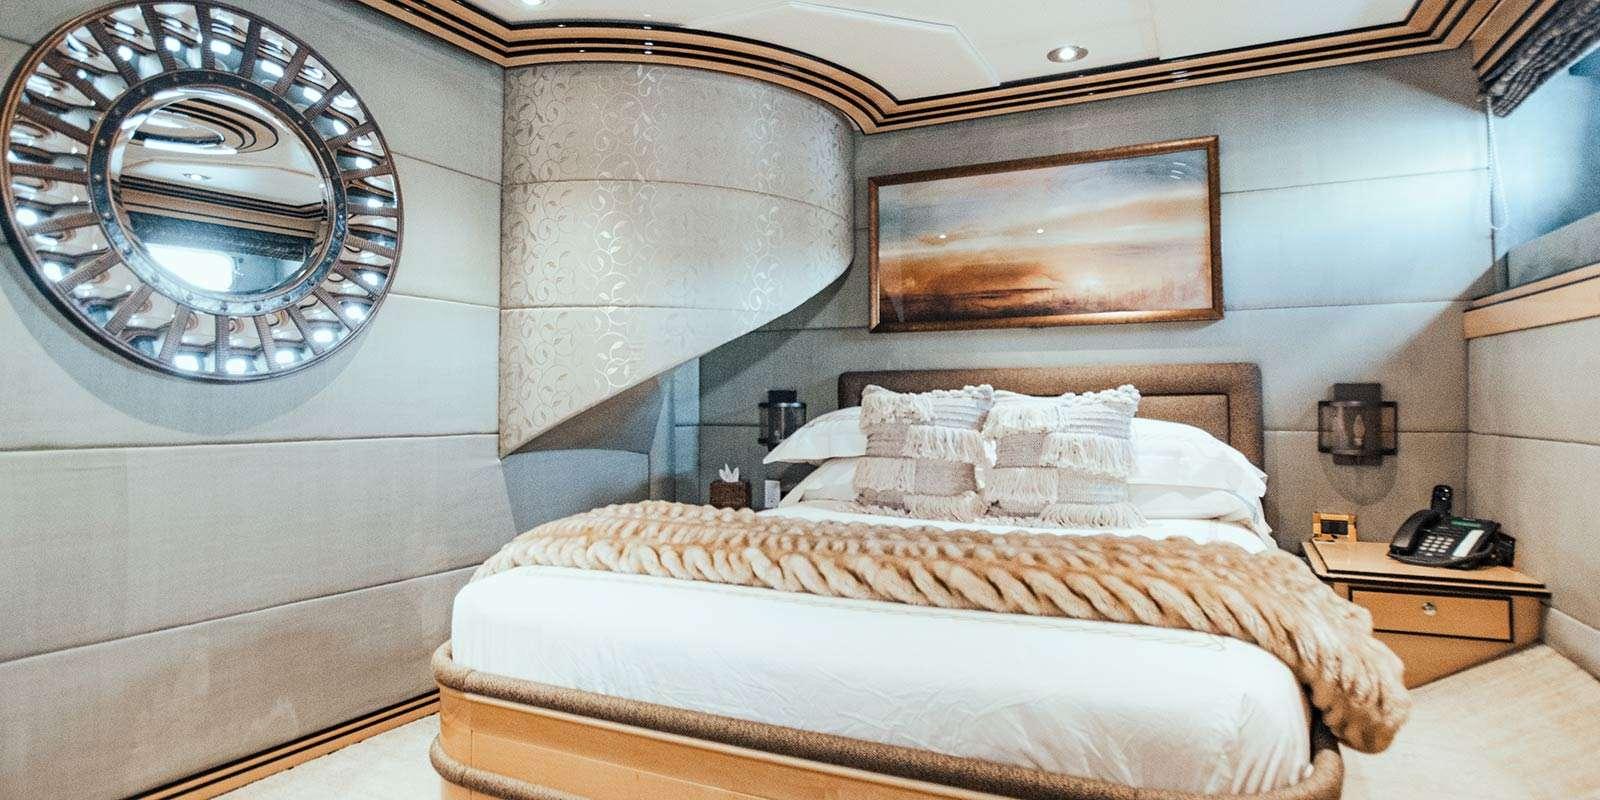 Impulsive yacht image # 7